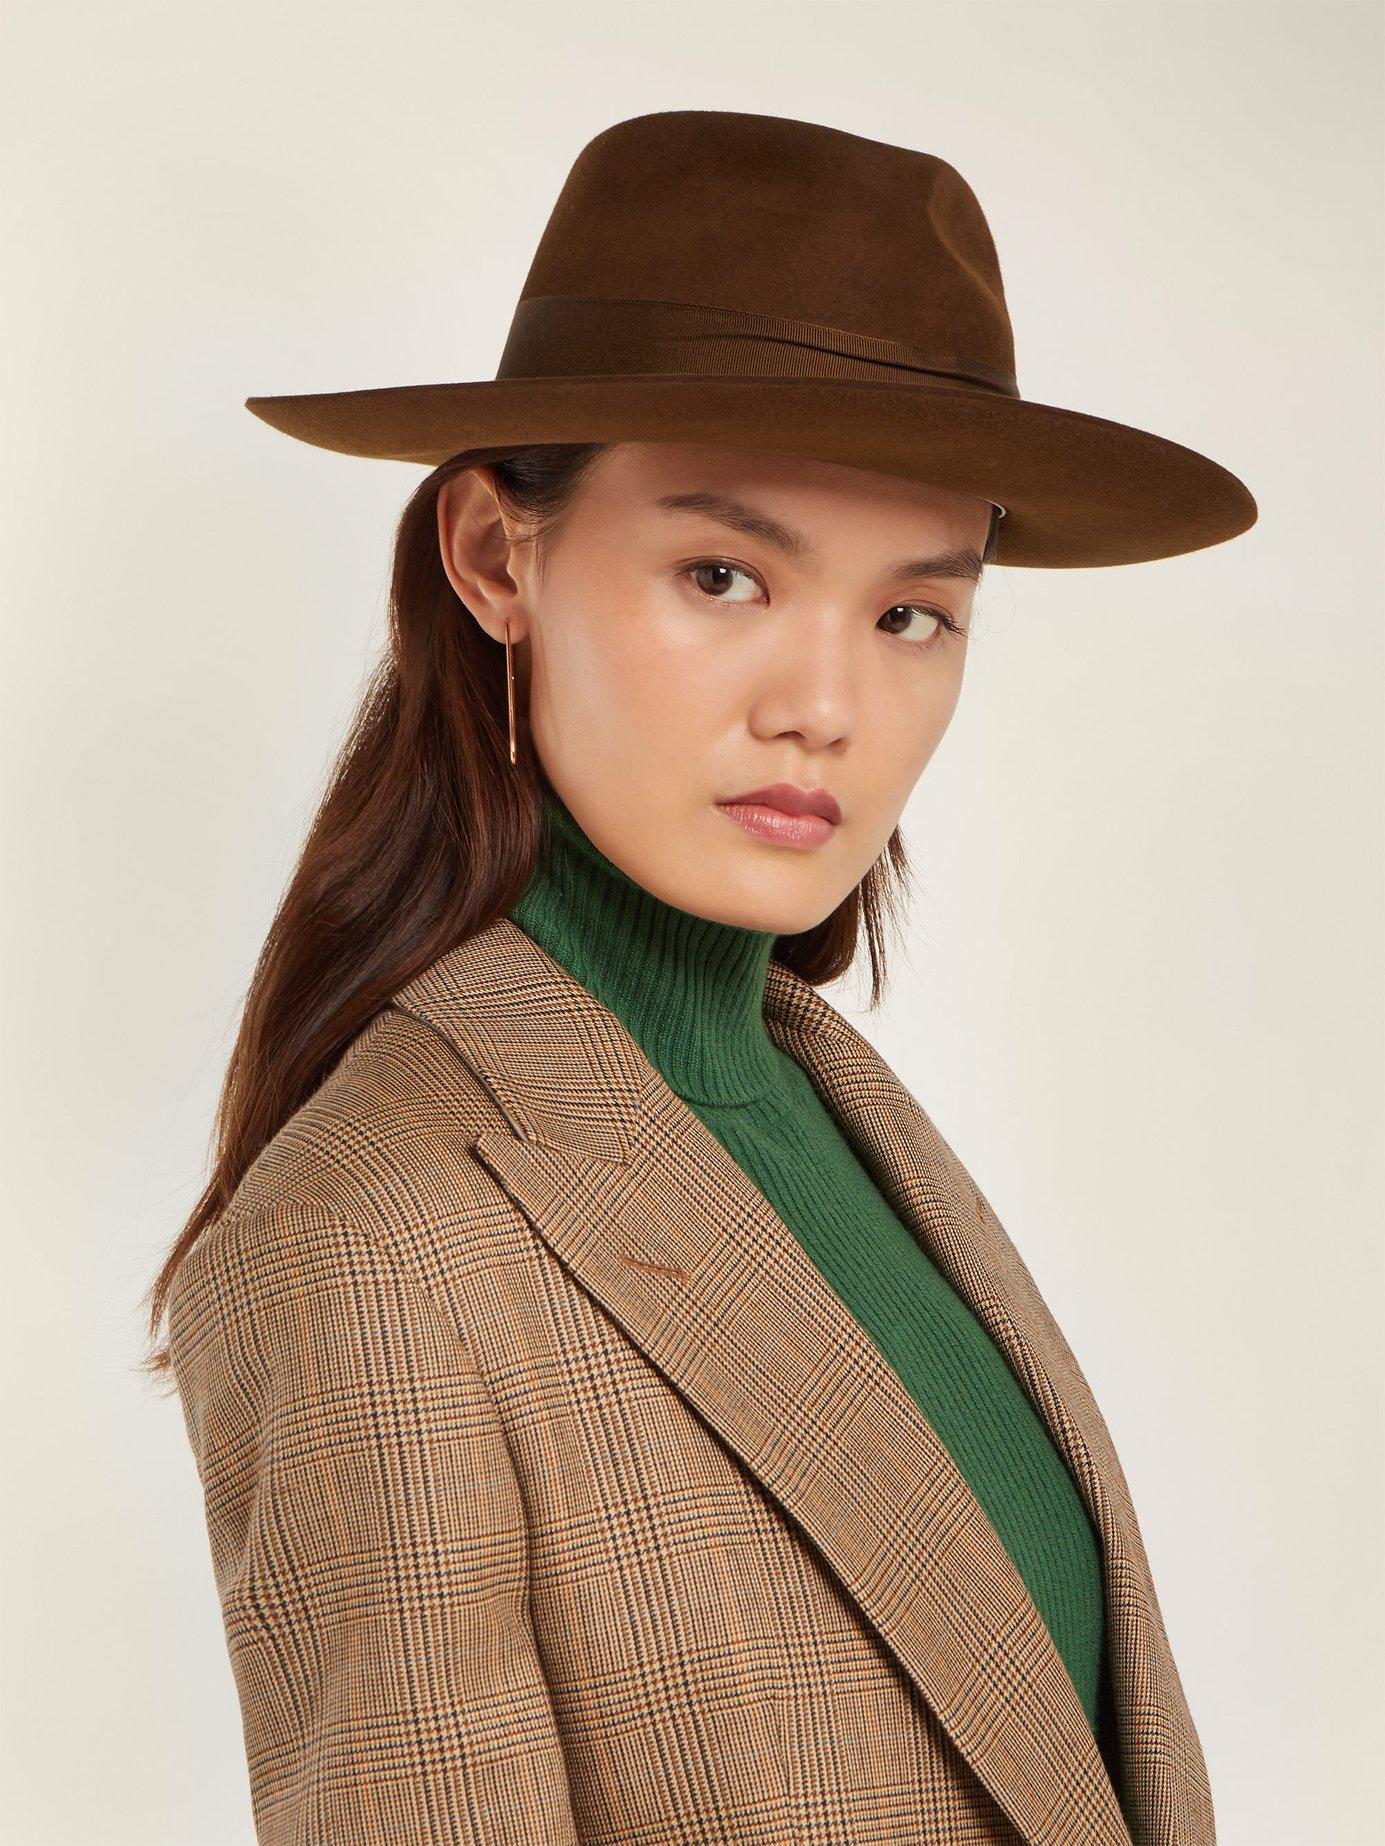 Hillier Bartley X Lock   Co. Portobello Felt Fedora Hat in Brown - Lyst 73be15e0206